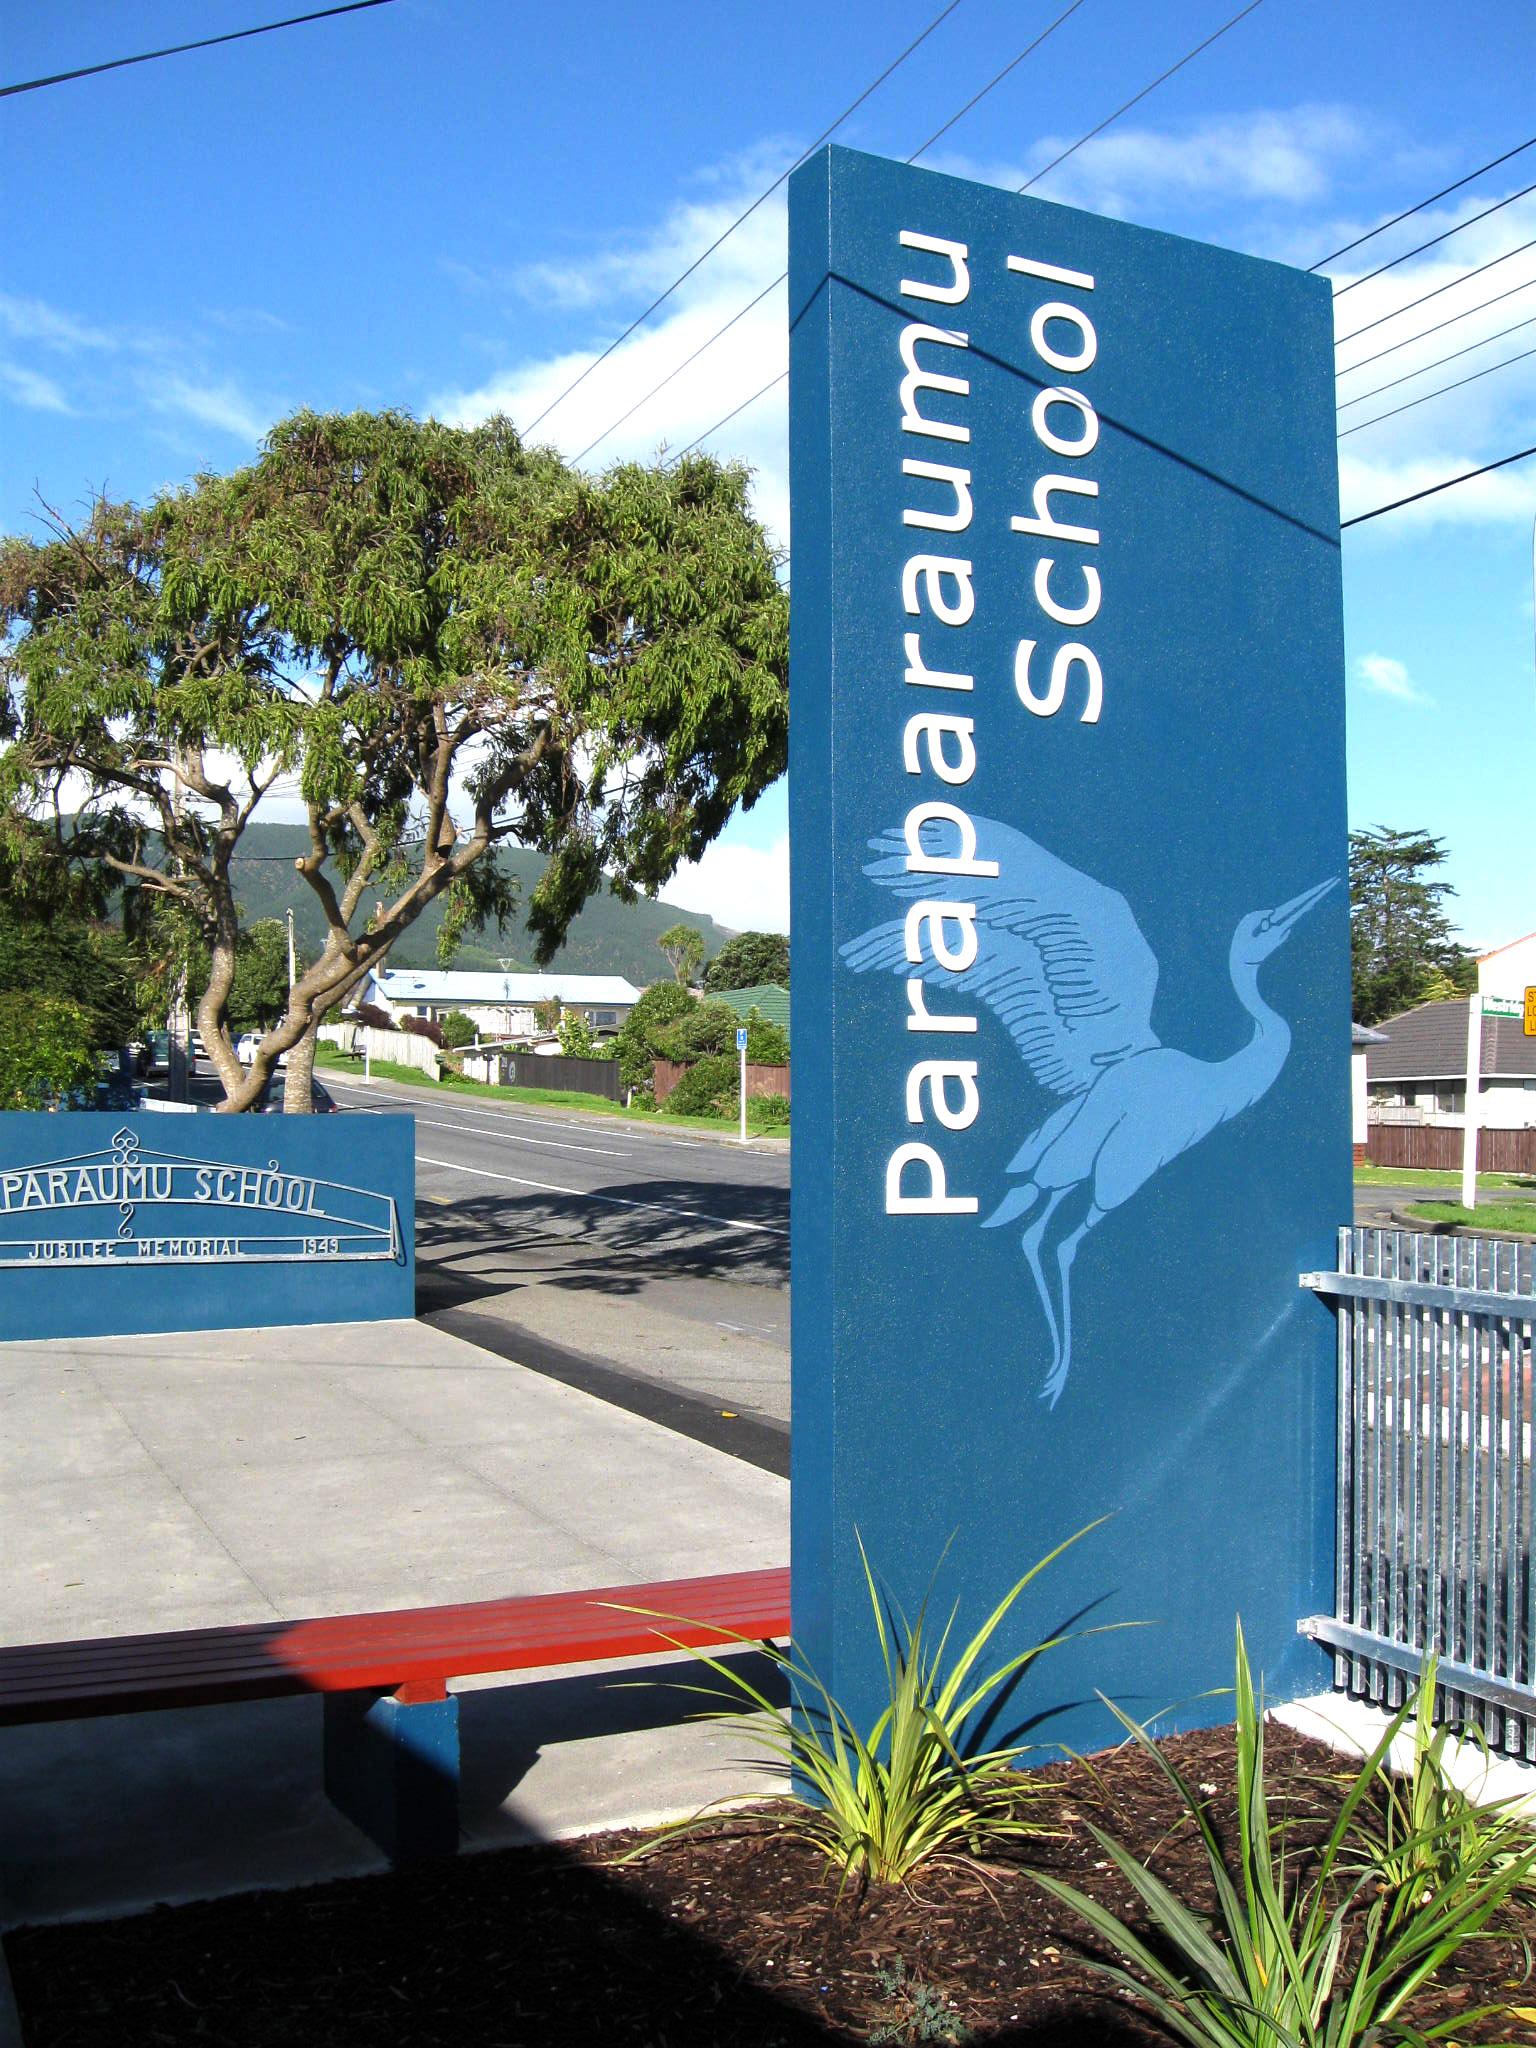 Paraparaumu School